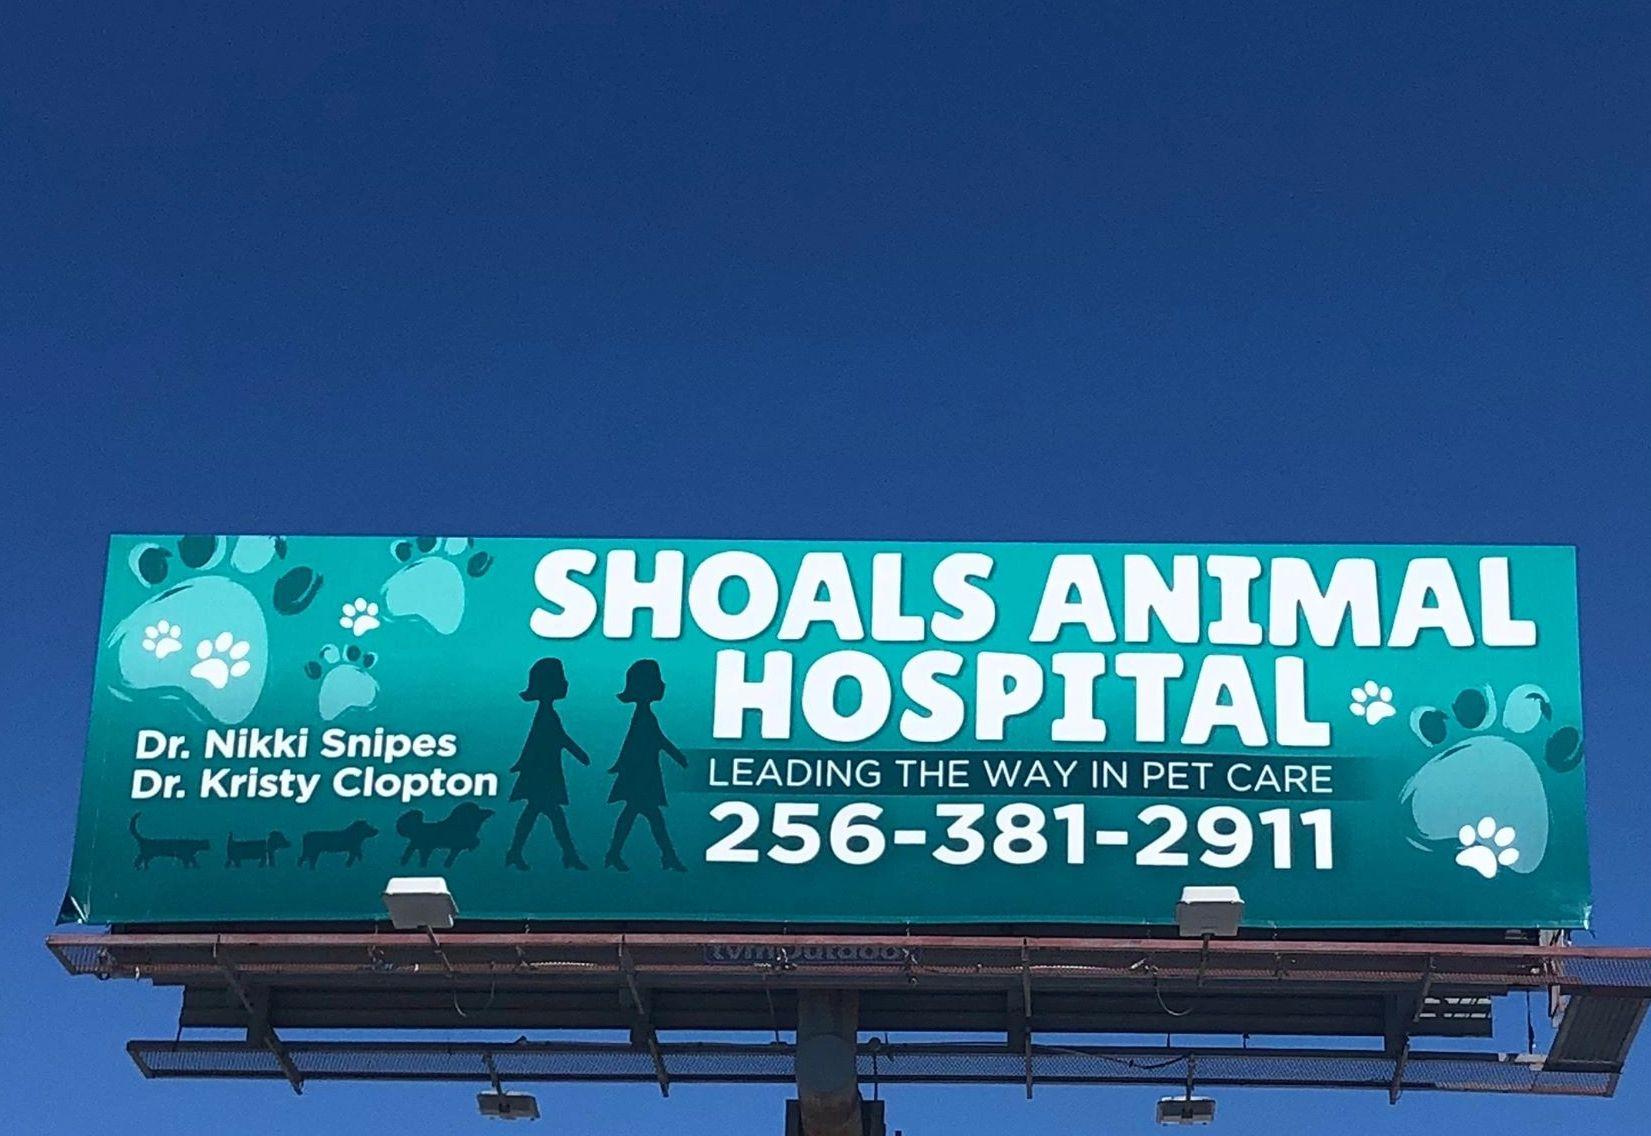 Shoals Animal Hospital